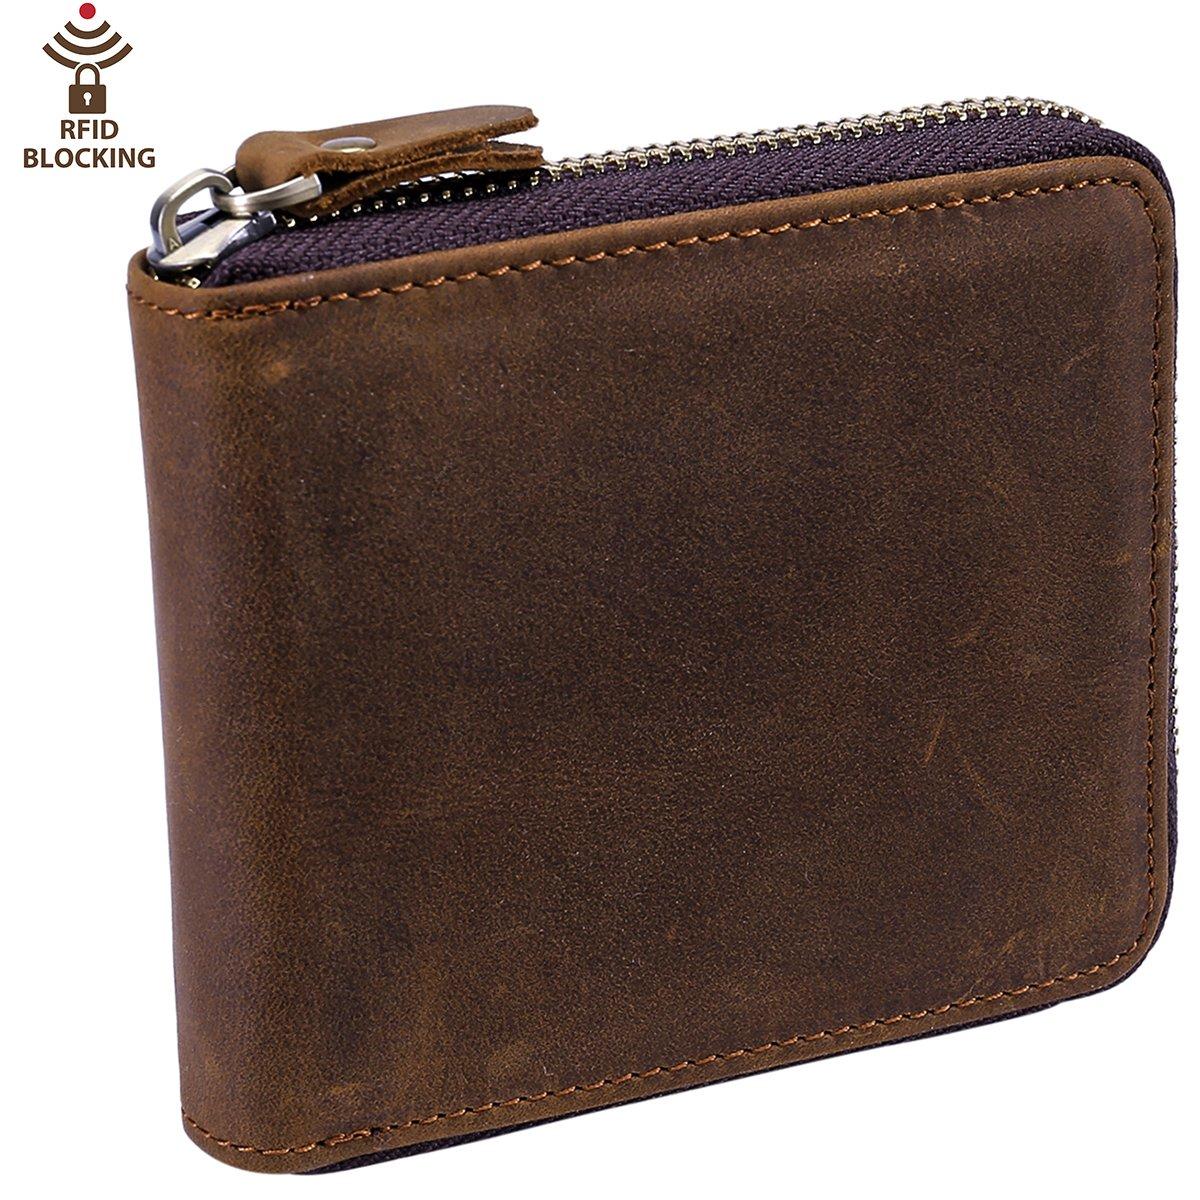 Itslife Men's RFID Blocking Leather Zipper Around Wallet Travel ID Card Window Bifold